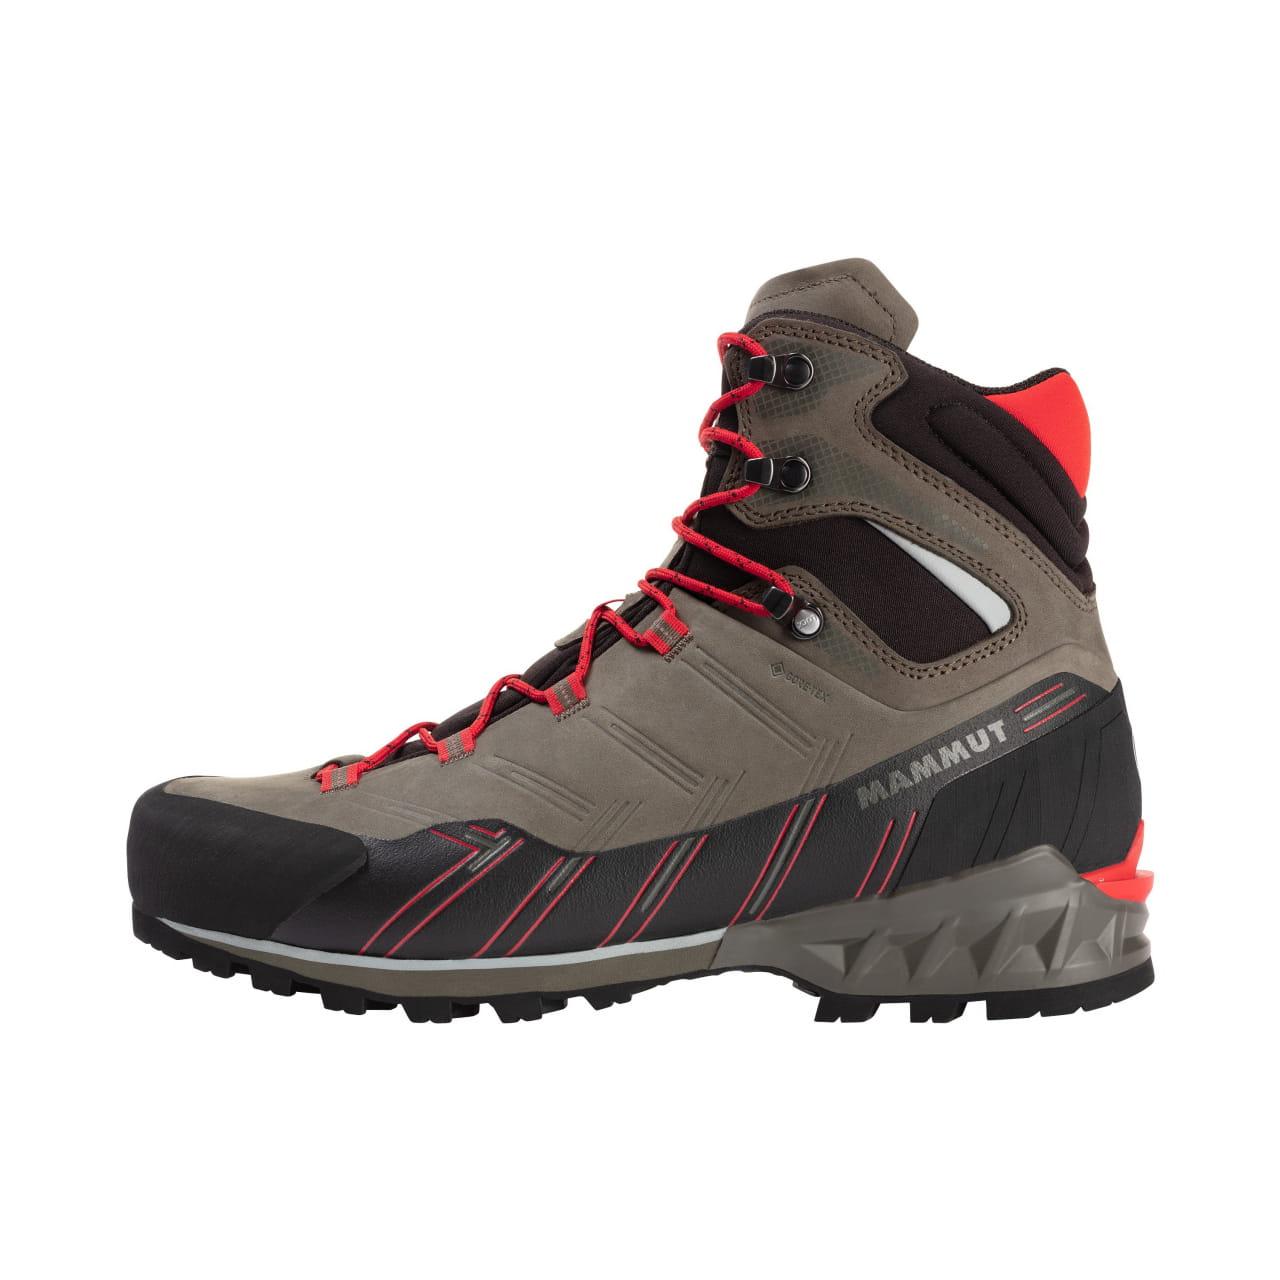 Moderné horolezecká topánka Nubuck Mammut Kento Guide High GTX Men